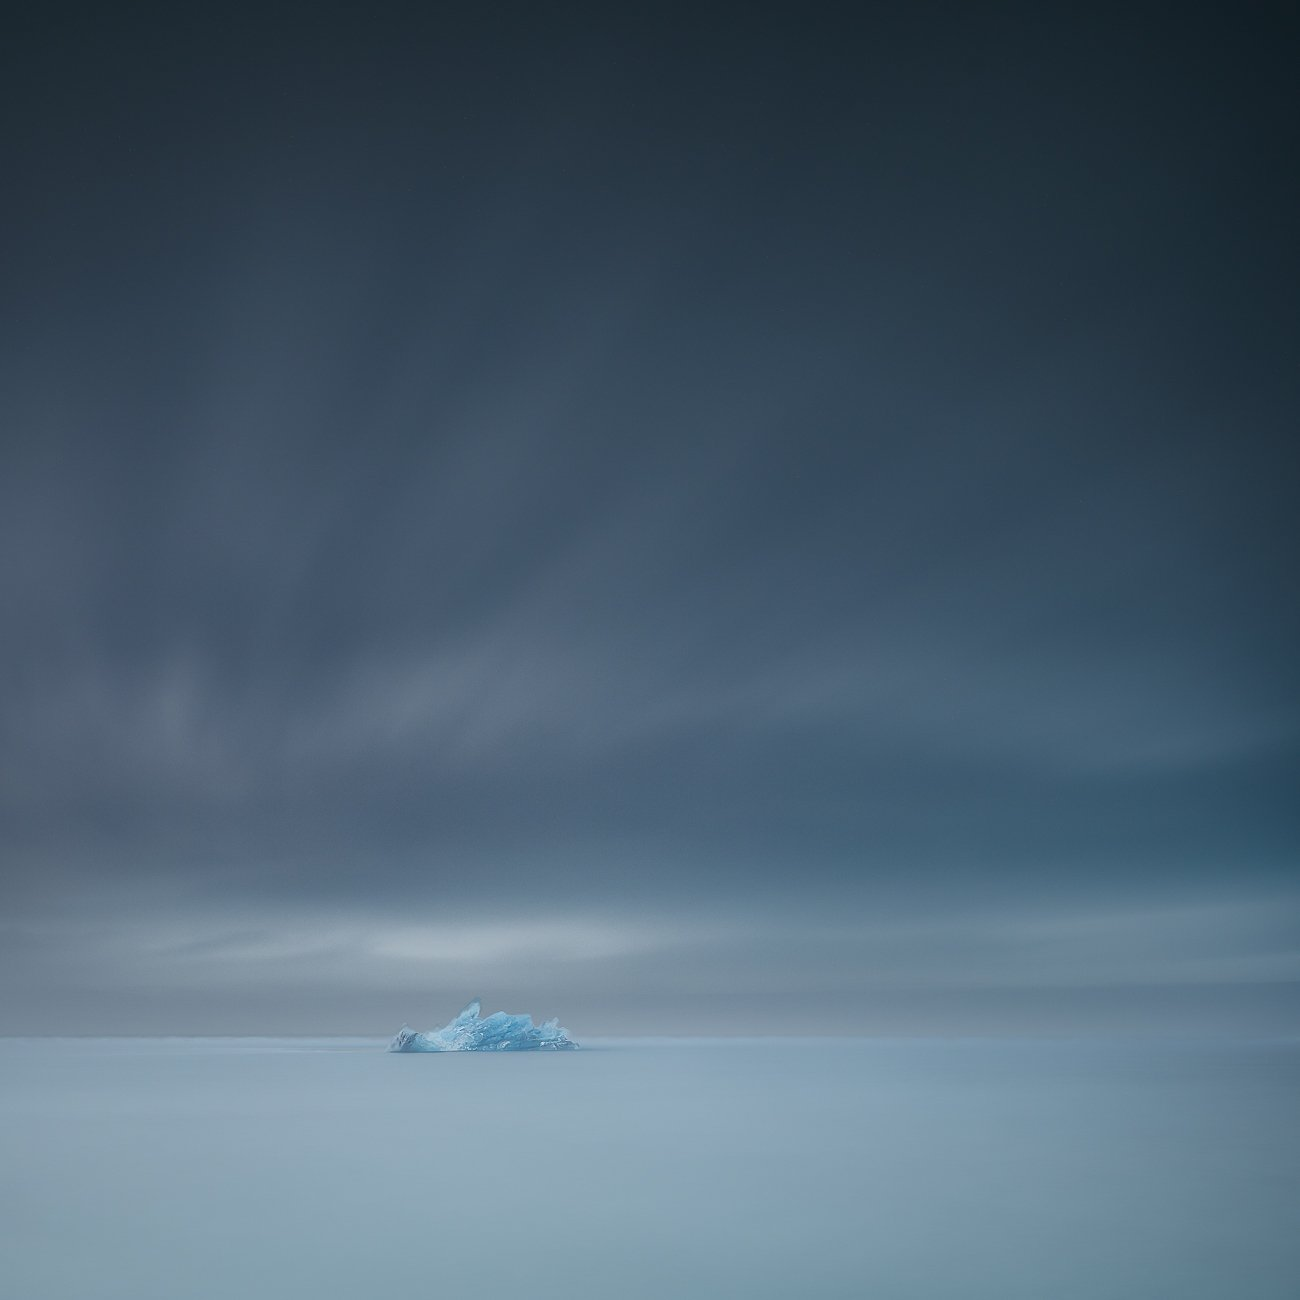 iceland,nikon,zeiss 21mm,iceberg,minimalismus,long exposure,sky,travel,glacier lagoon,felix ostapenko,, Felix Ostapenko